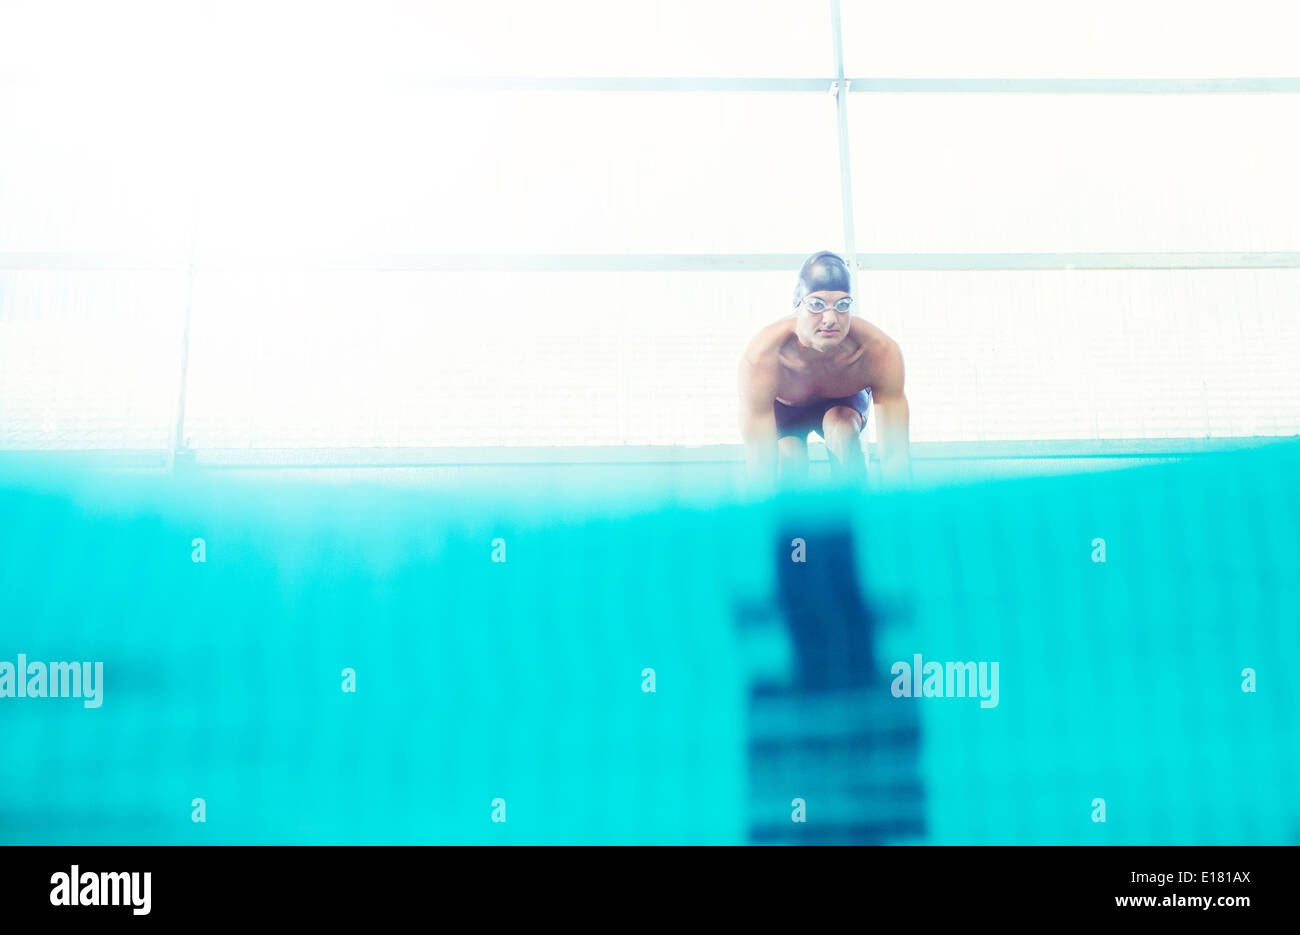 Swimmers poised on starting blocks - Stock Image